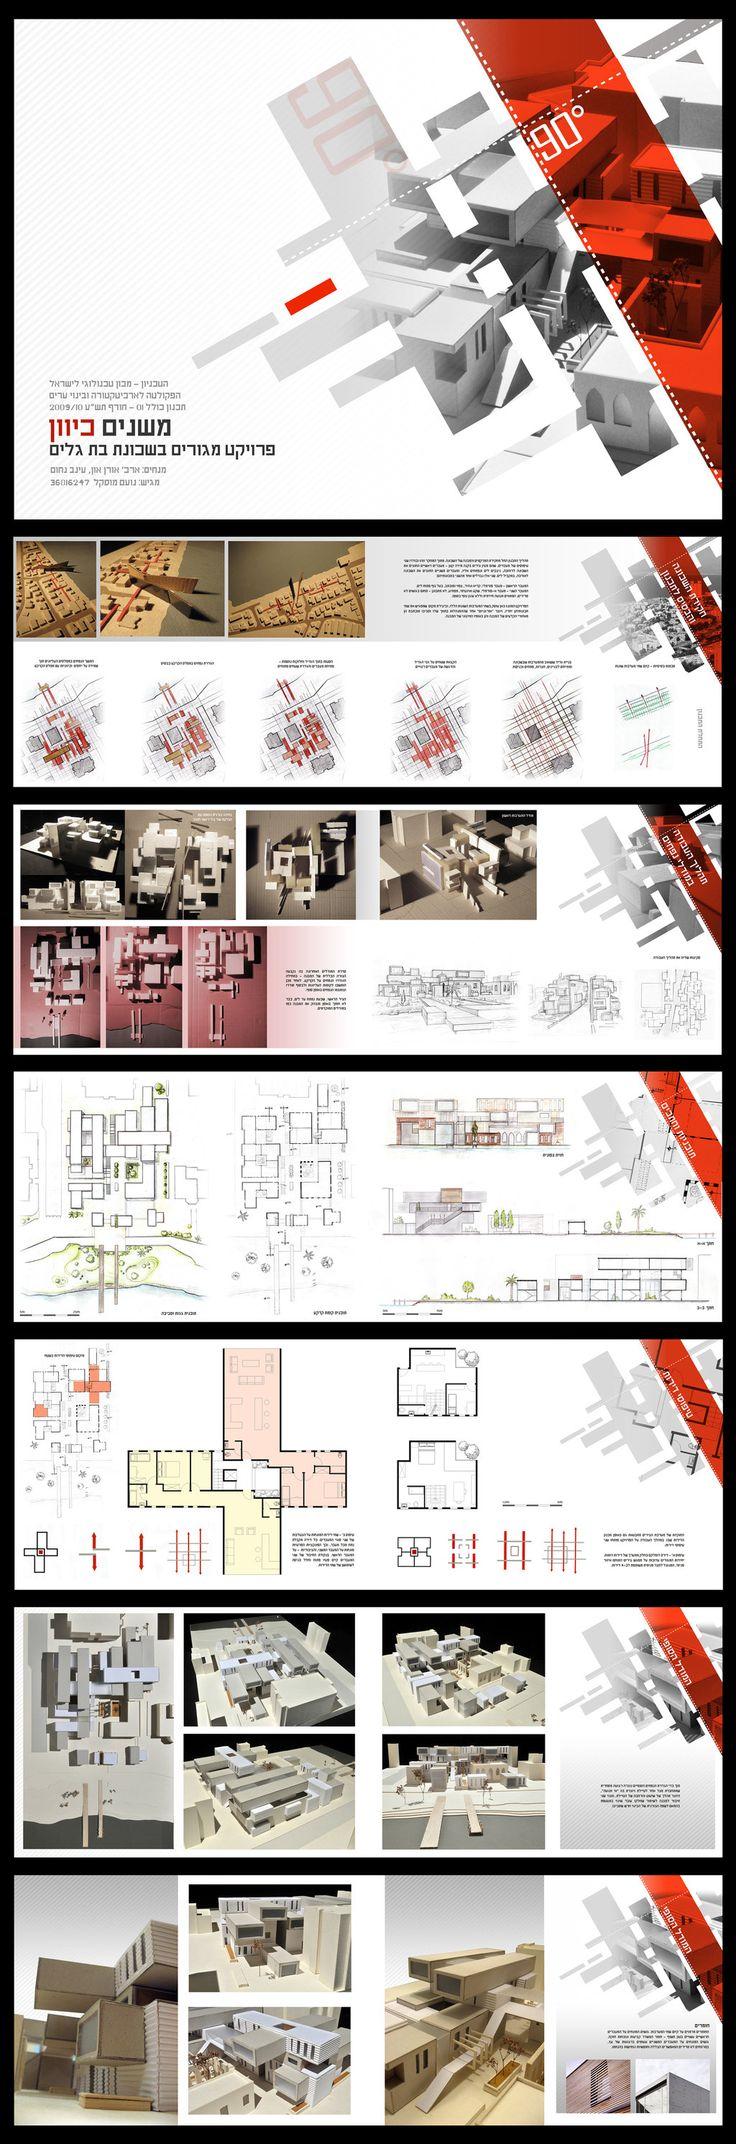 Haifa Projeto de Habitação POR * NoamM on deviantART